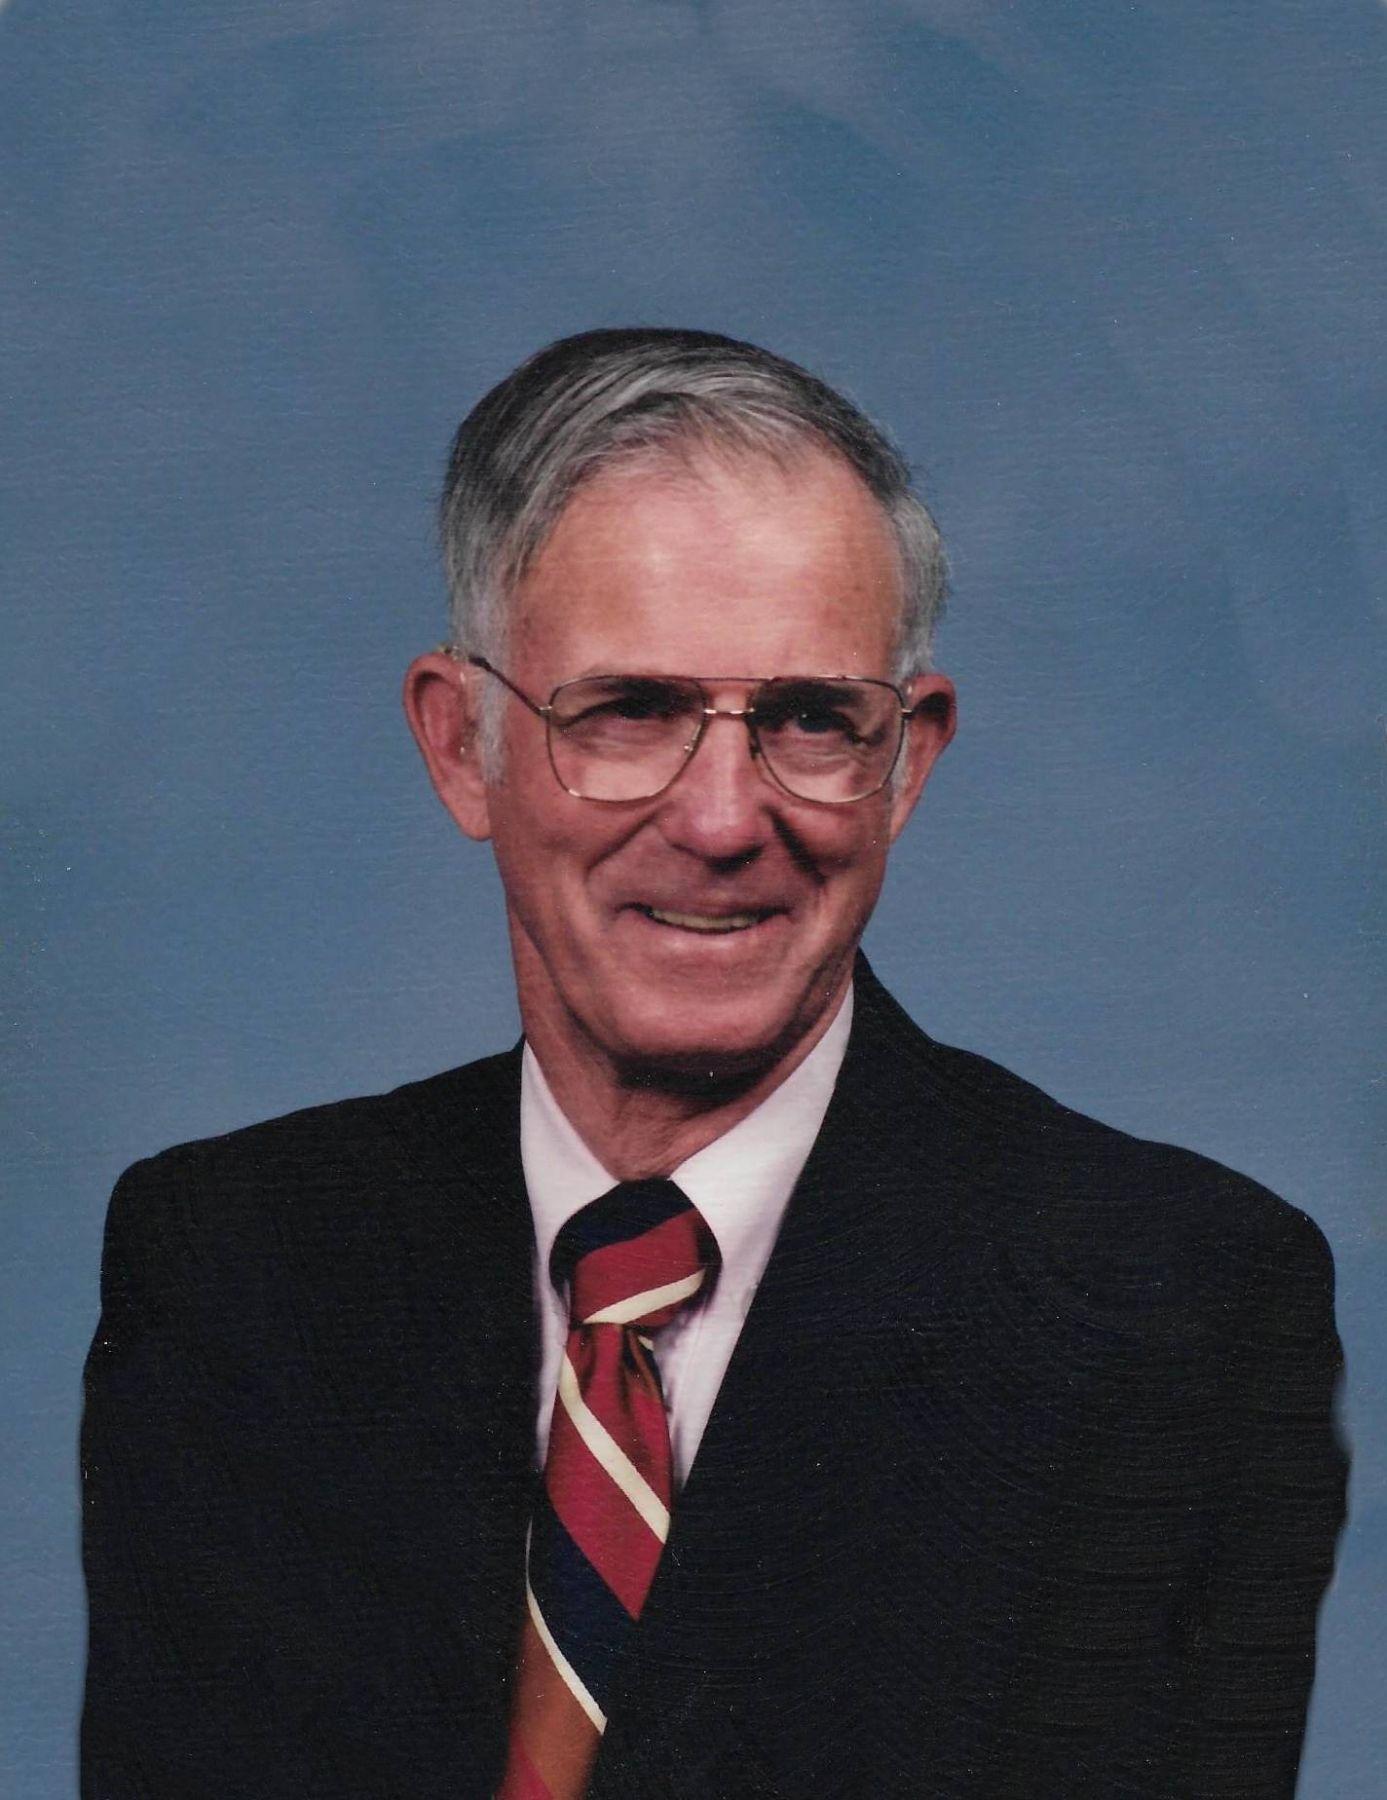 Paul Edward Doane Junior